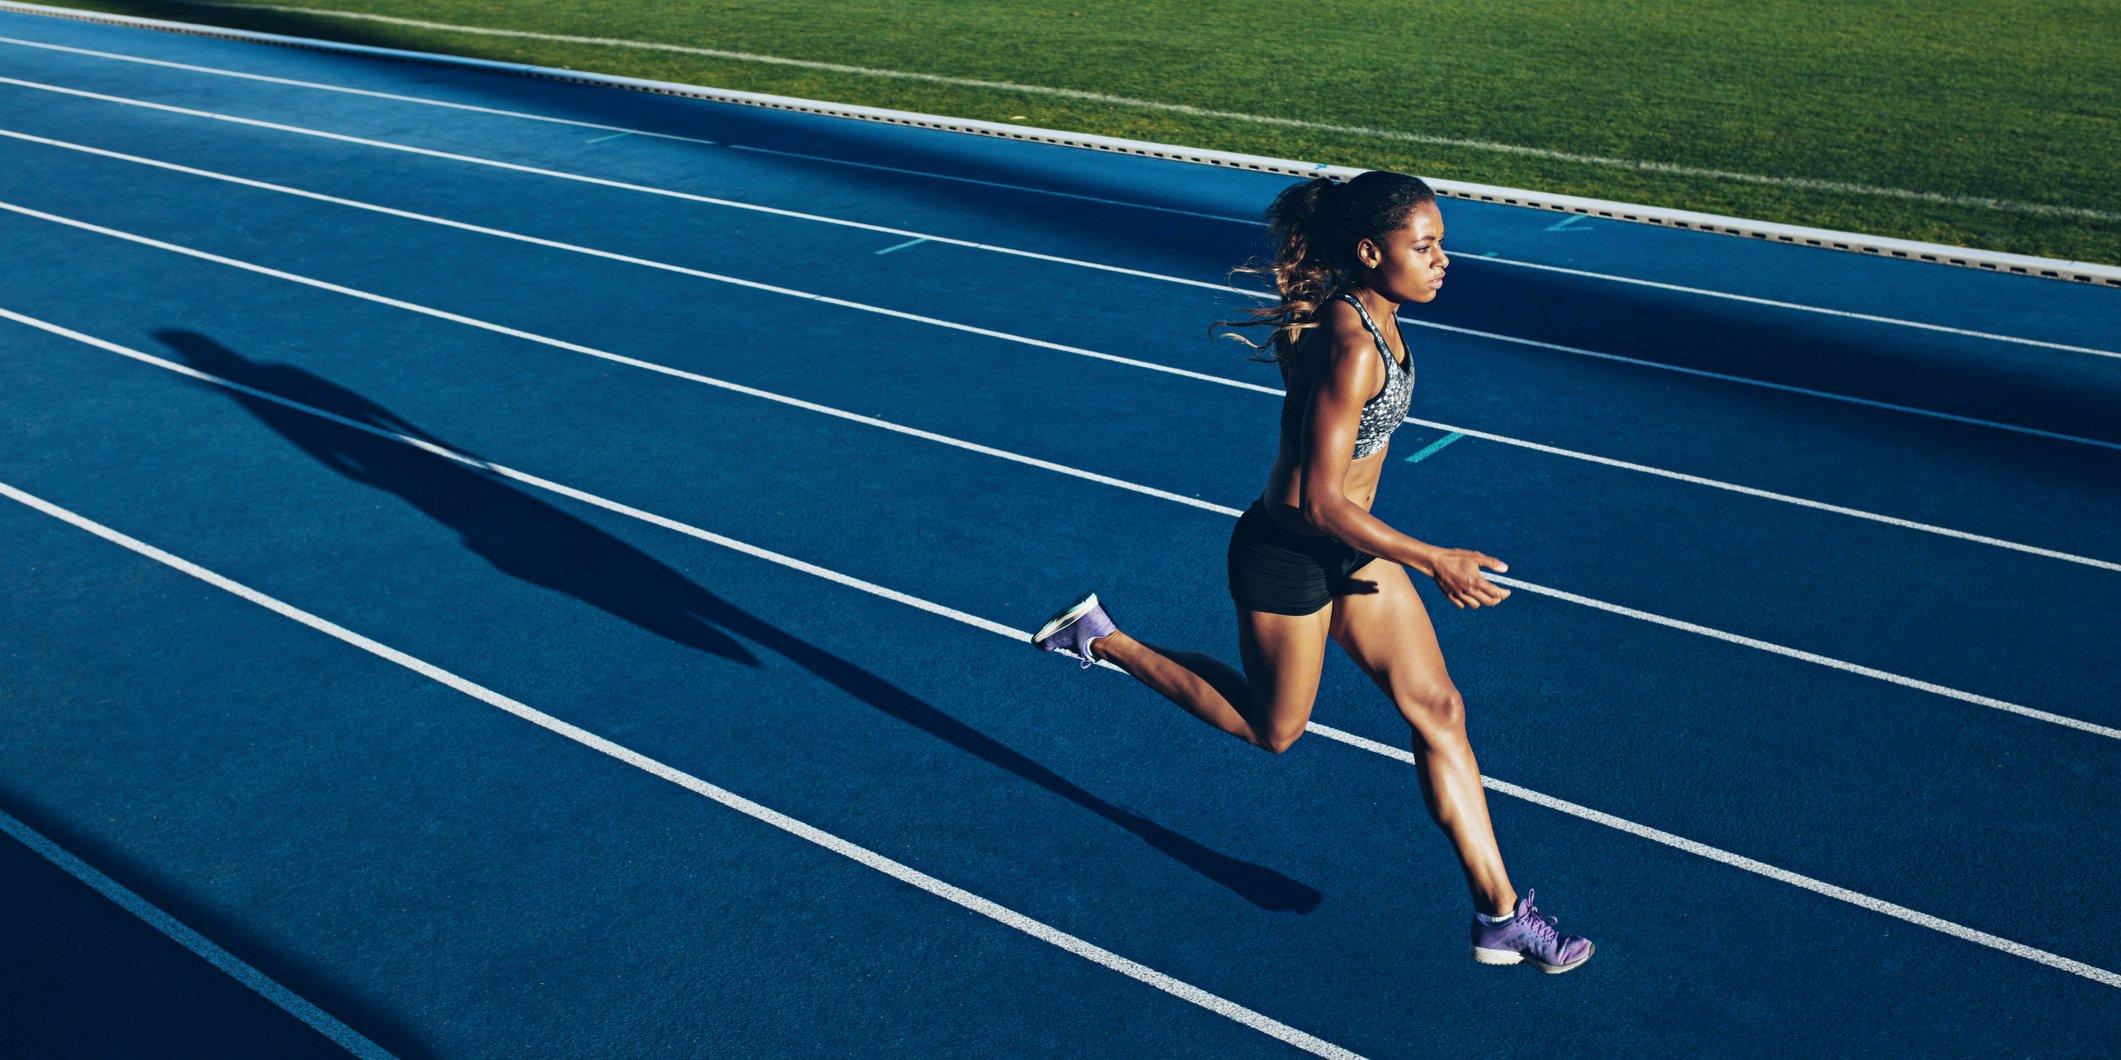 Athlete microbiome